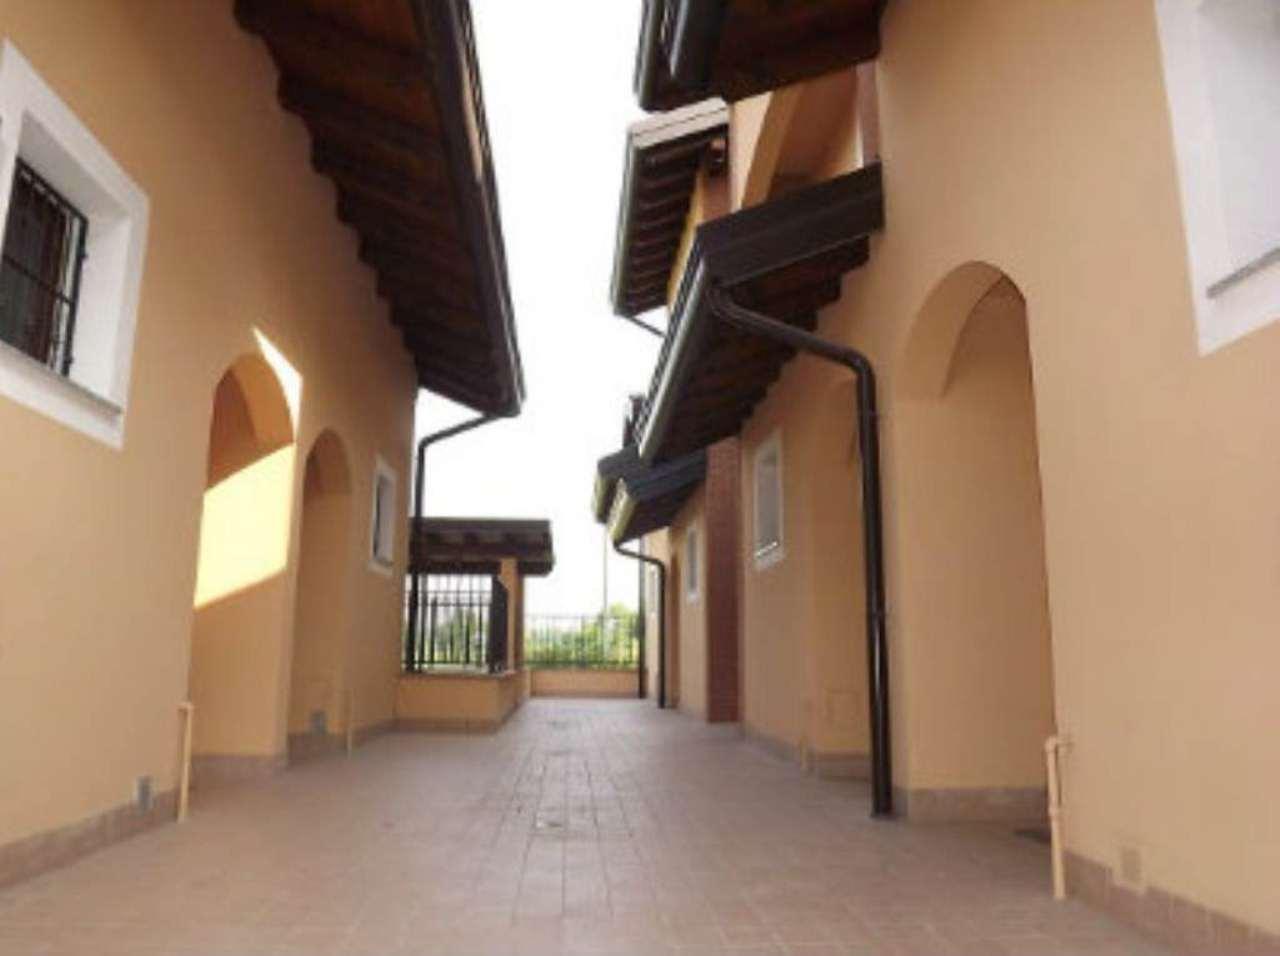 Bilocale Treviglio Via Geromina 4